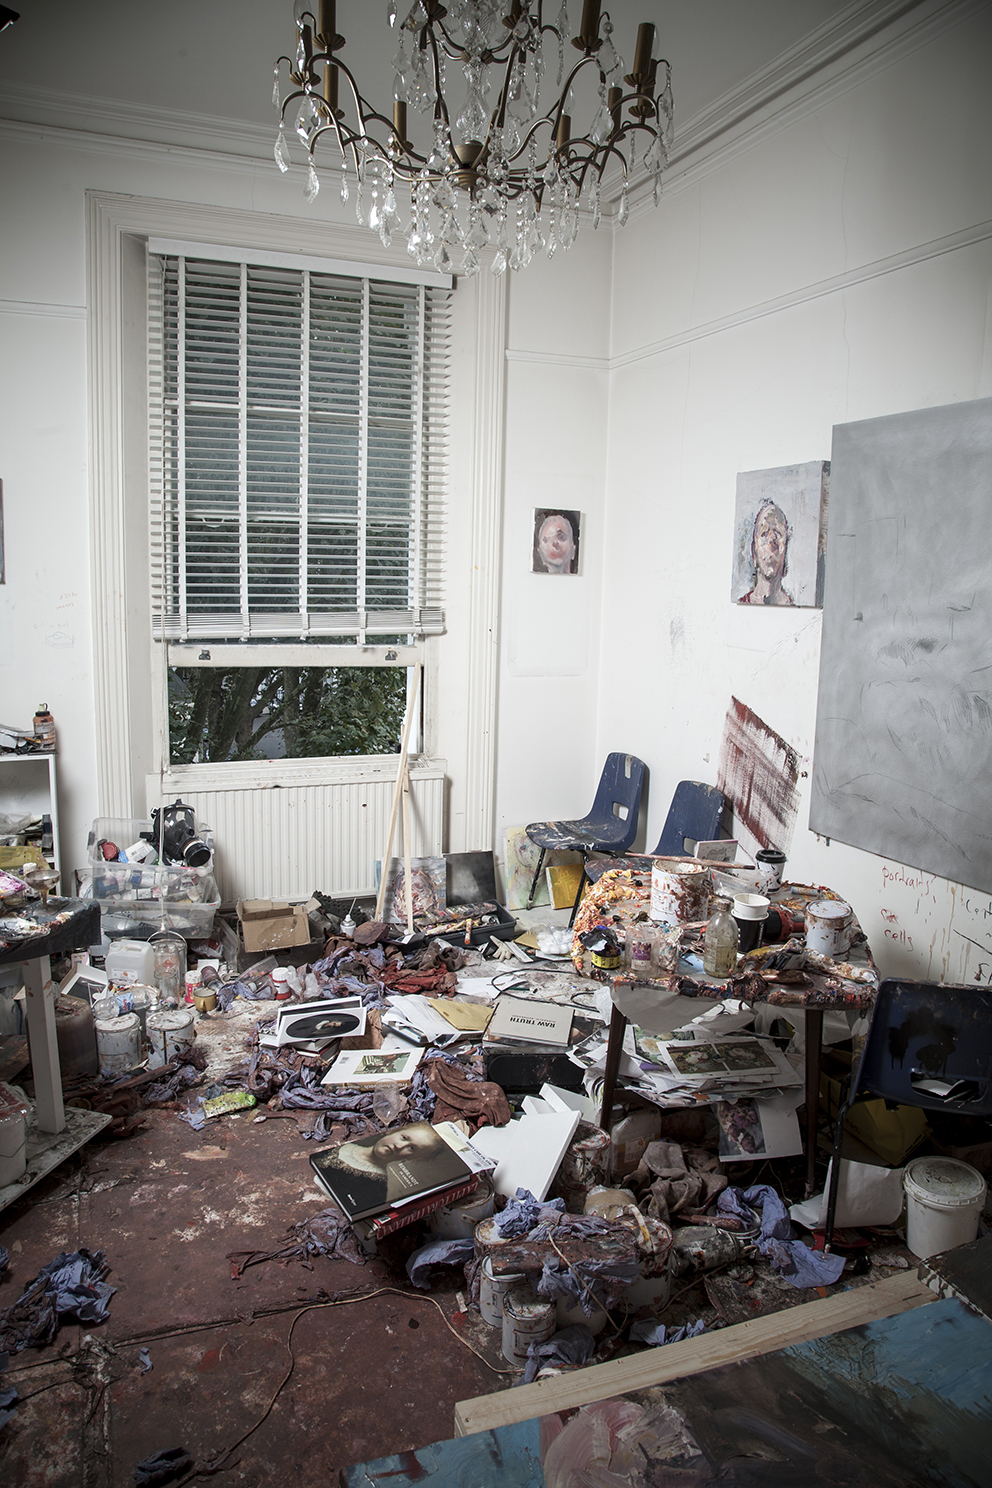 Artist and painter Antony Micallef's artist studio